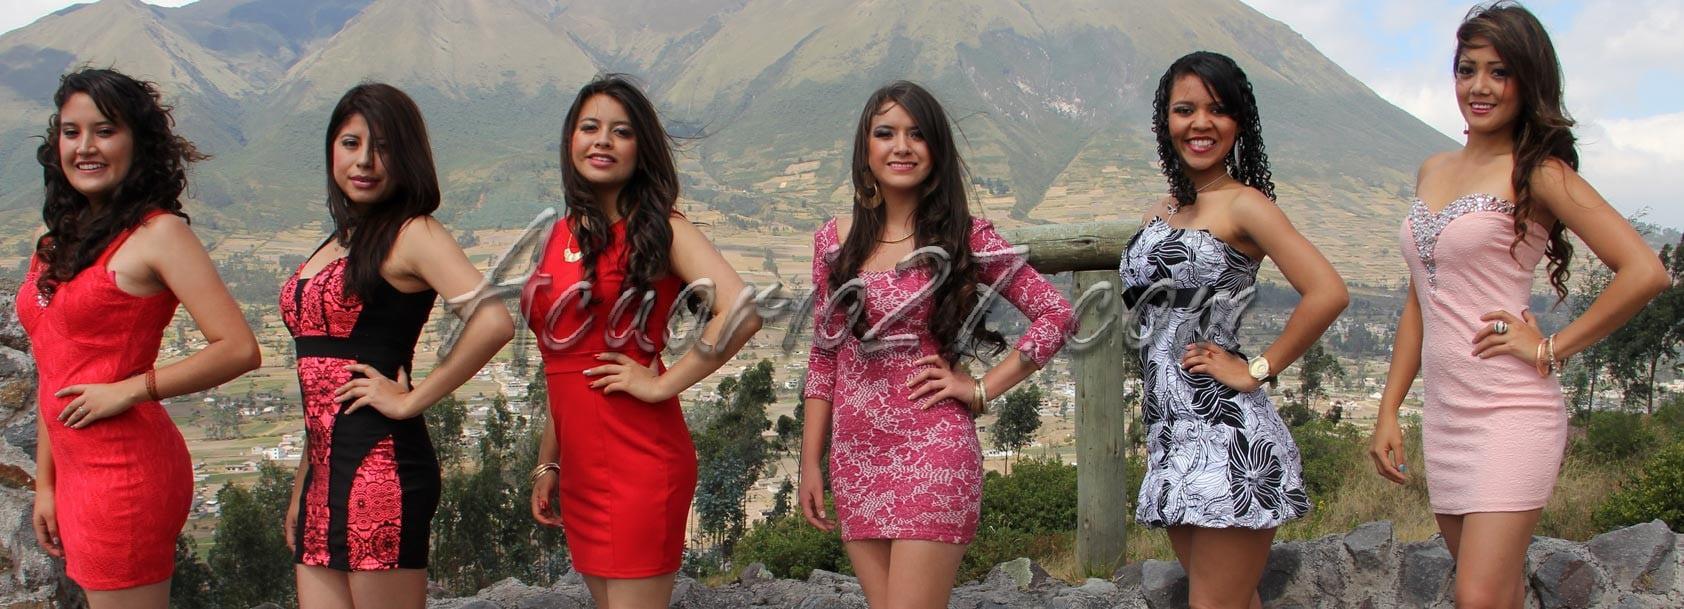 Candidatas a reina del YAMOR 2015, foto GAD Otavalo.